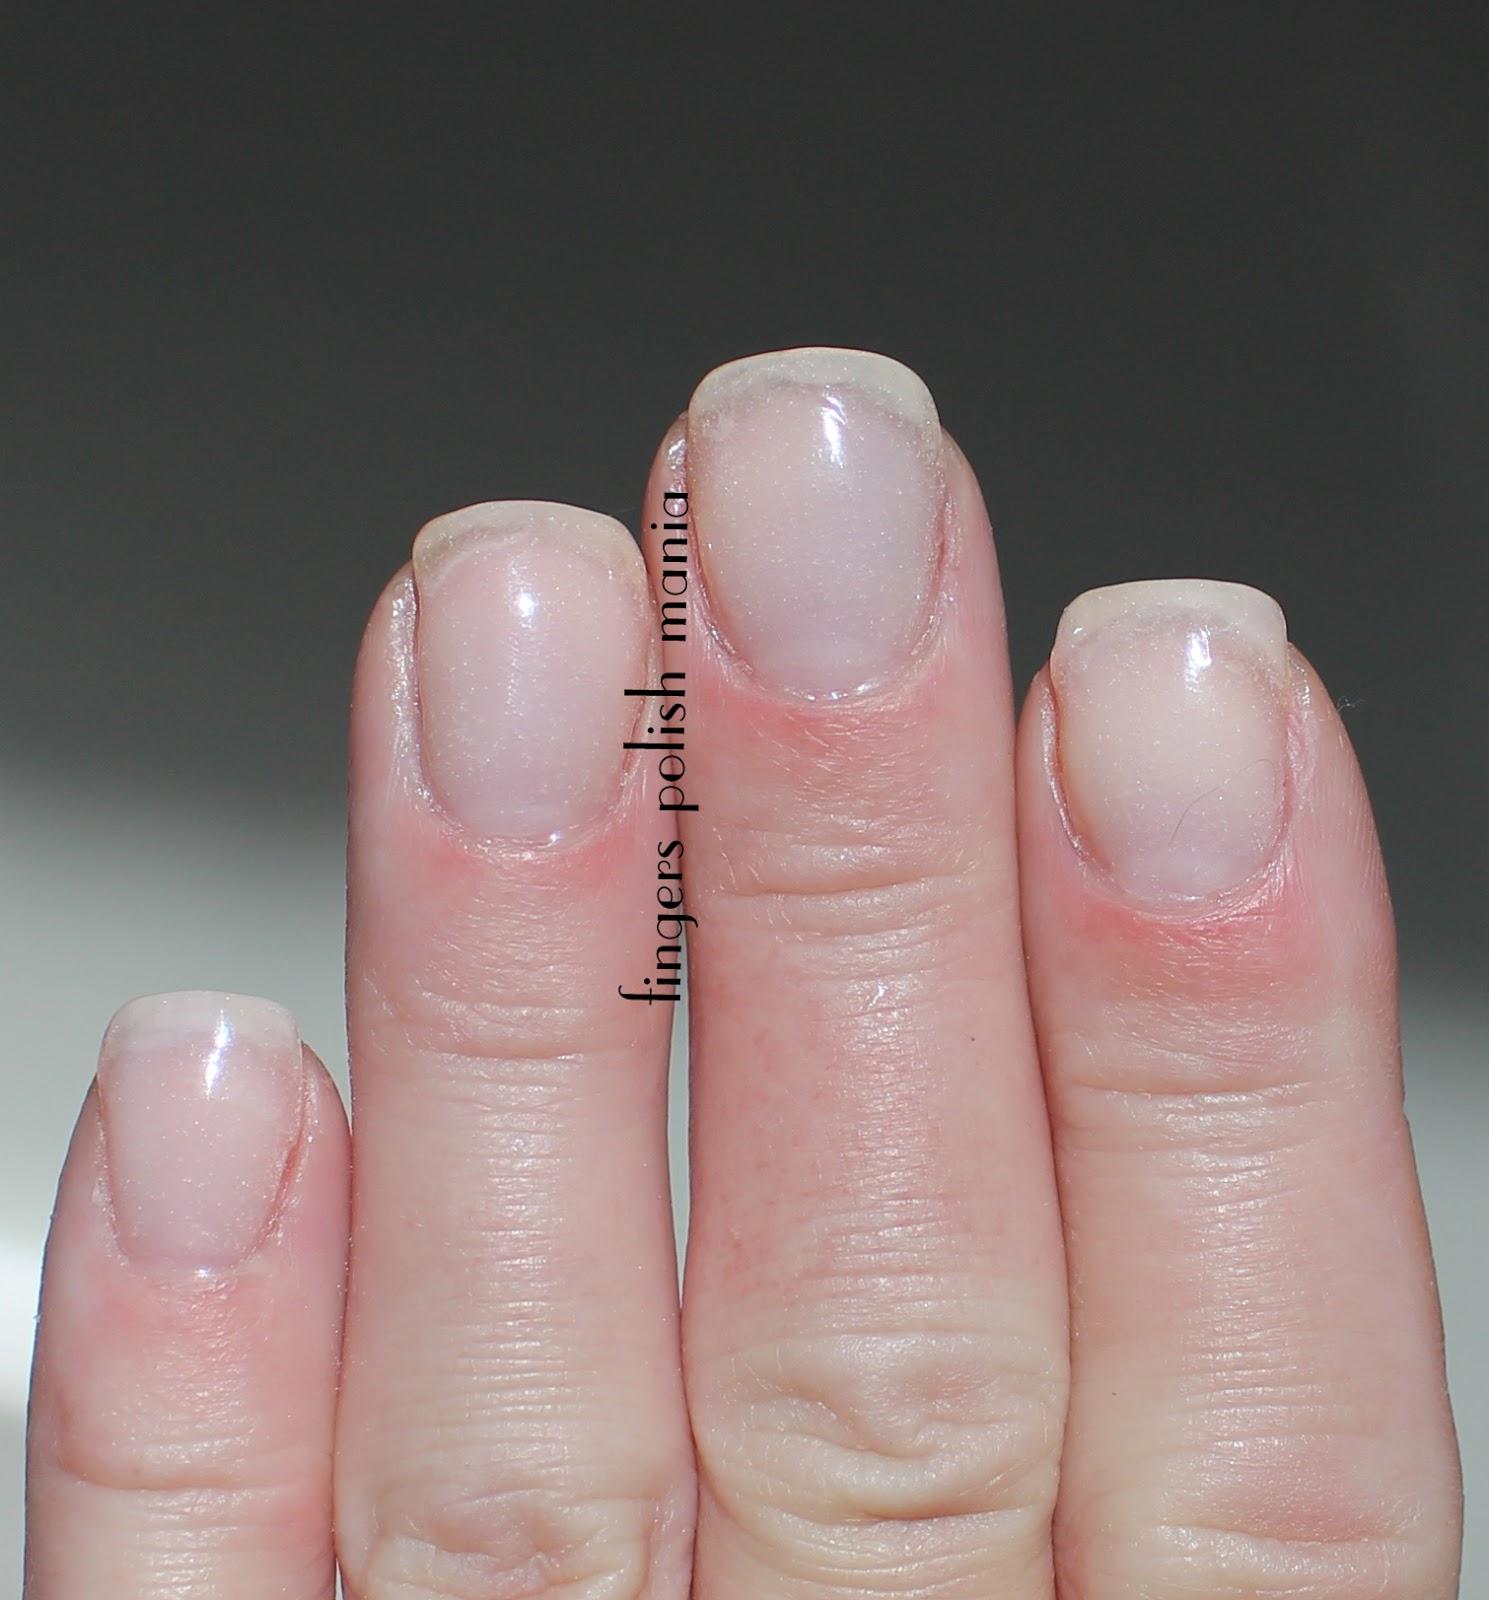 fingers polish mania: EZ Dip Gel Attempt #3